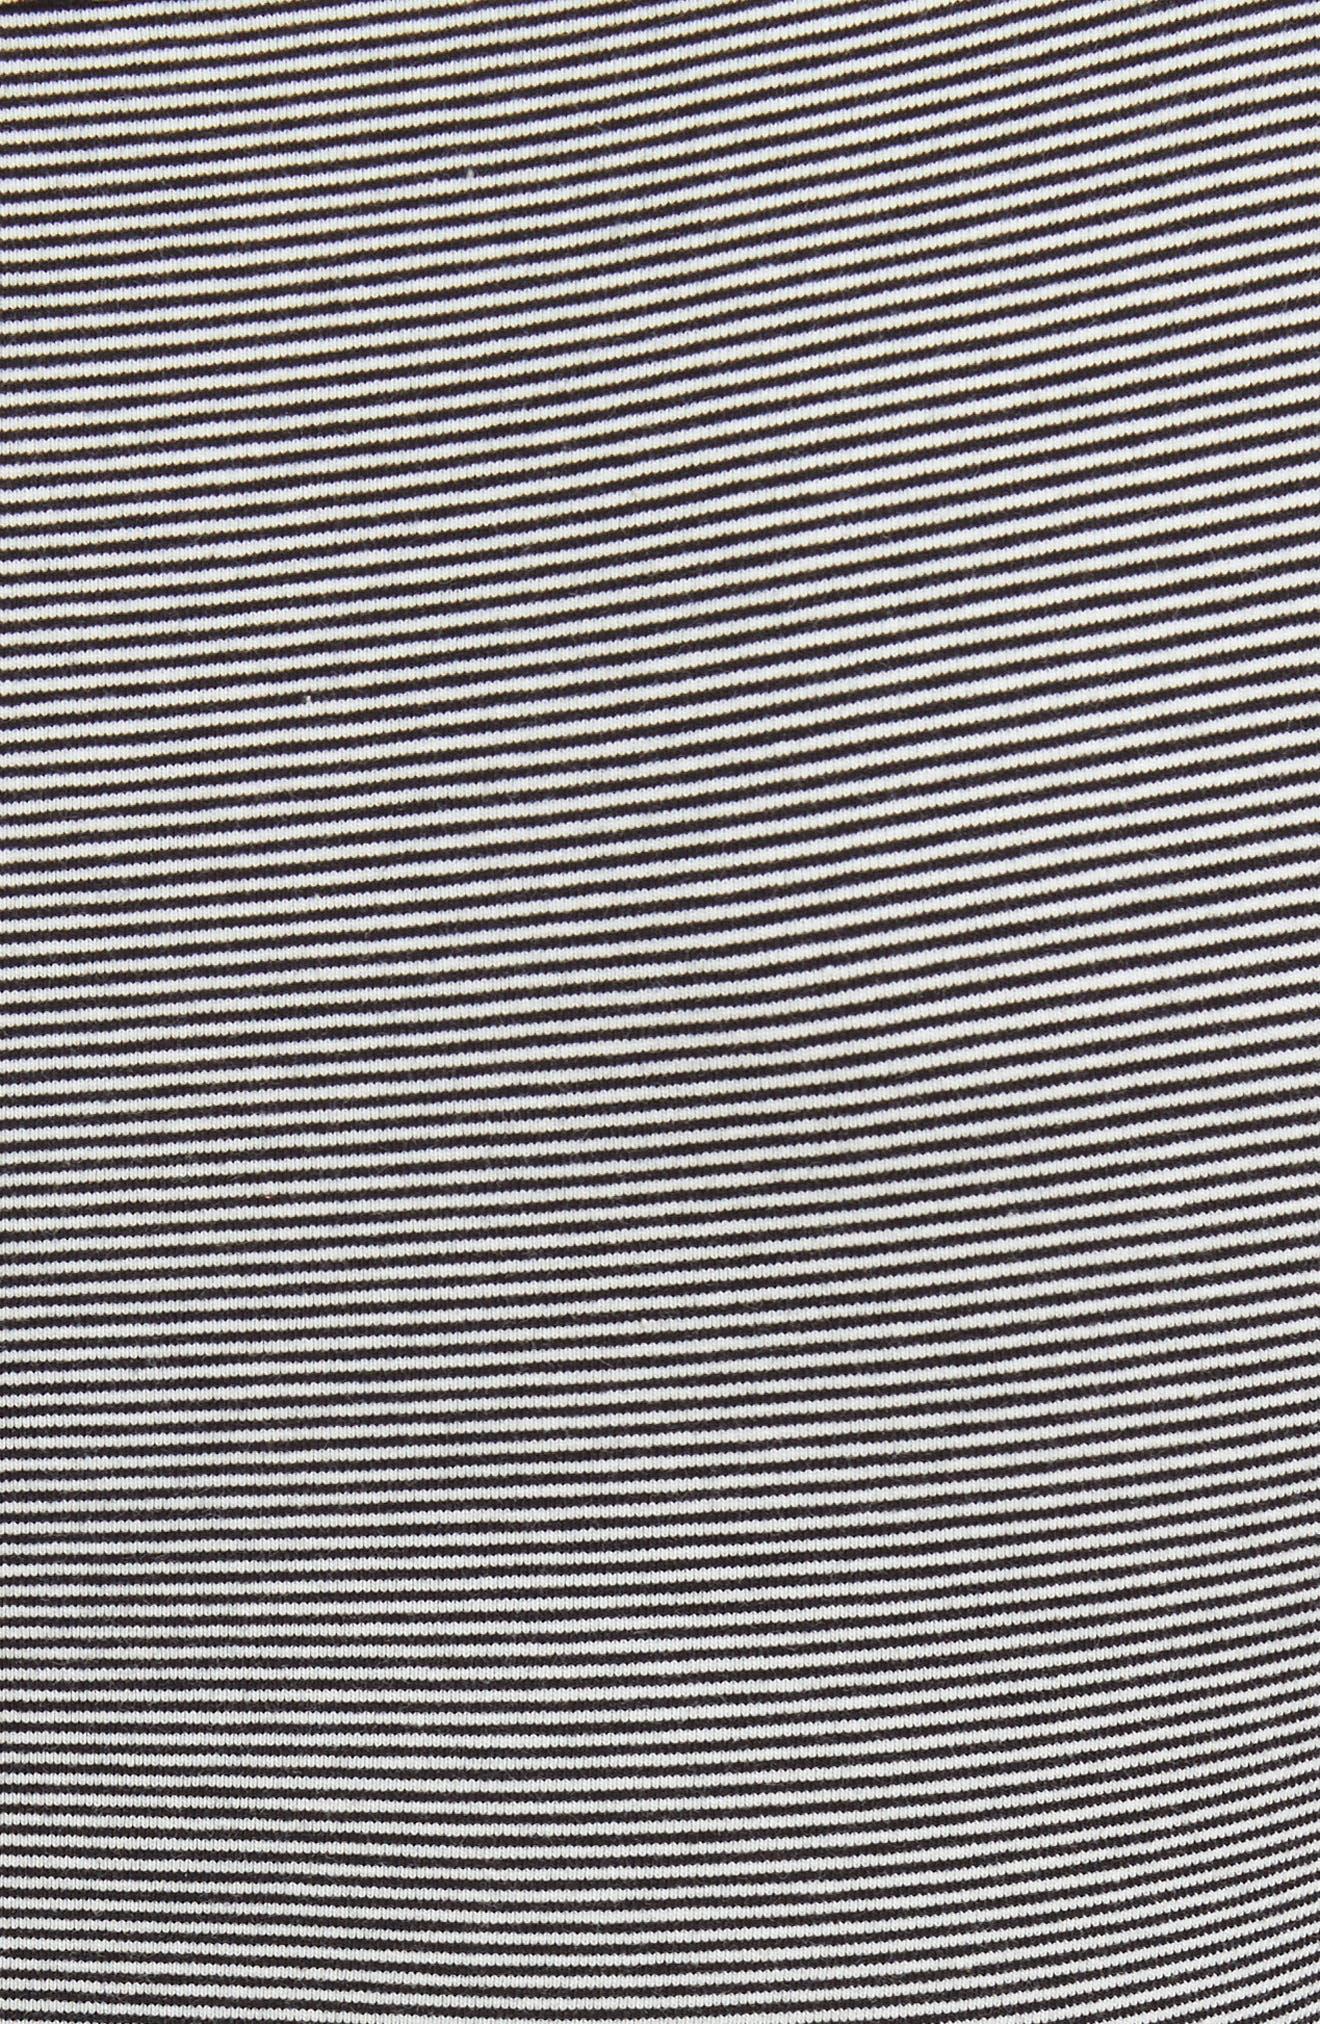 Penelope Ruffle Tee,                             Alternate thumbnail 5, color,                             Black